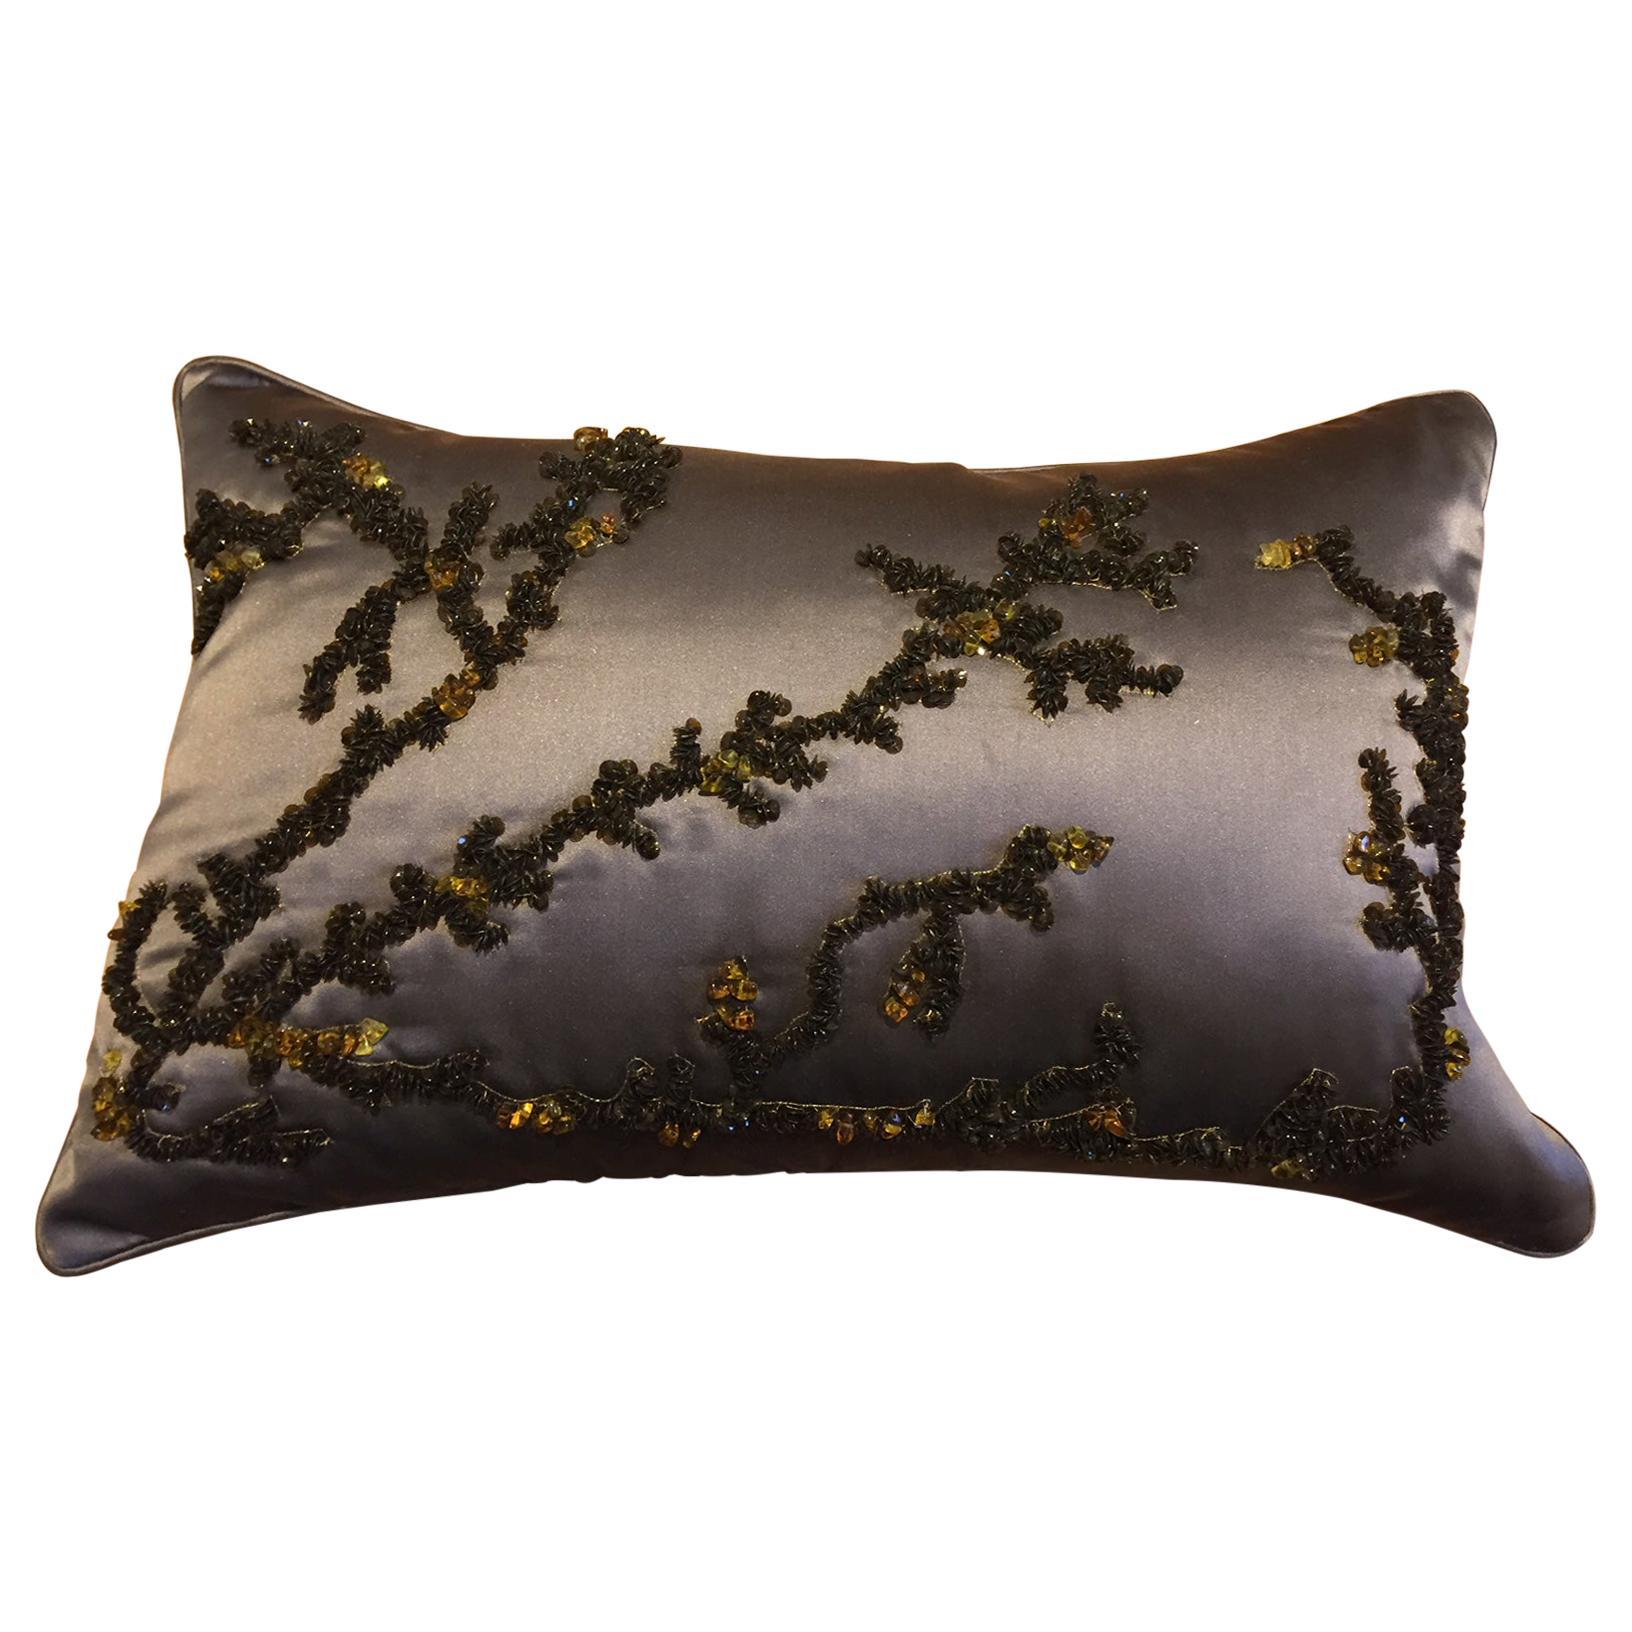 Hand Embroidered Coral Design Decorative Cushion Silk Satin Brown